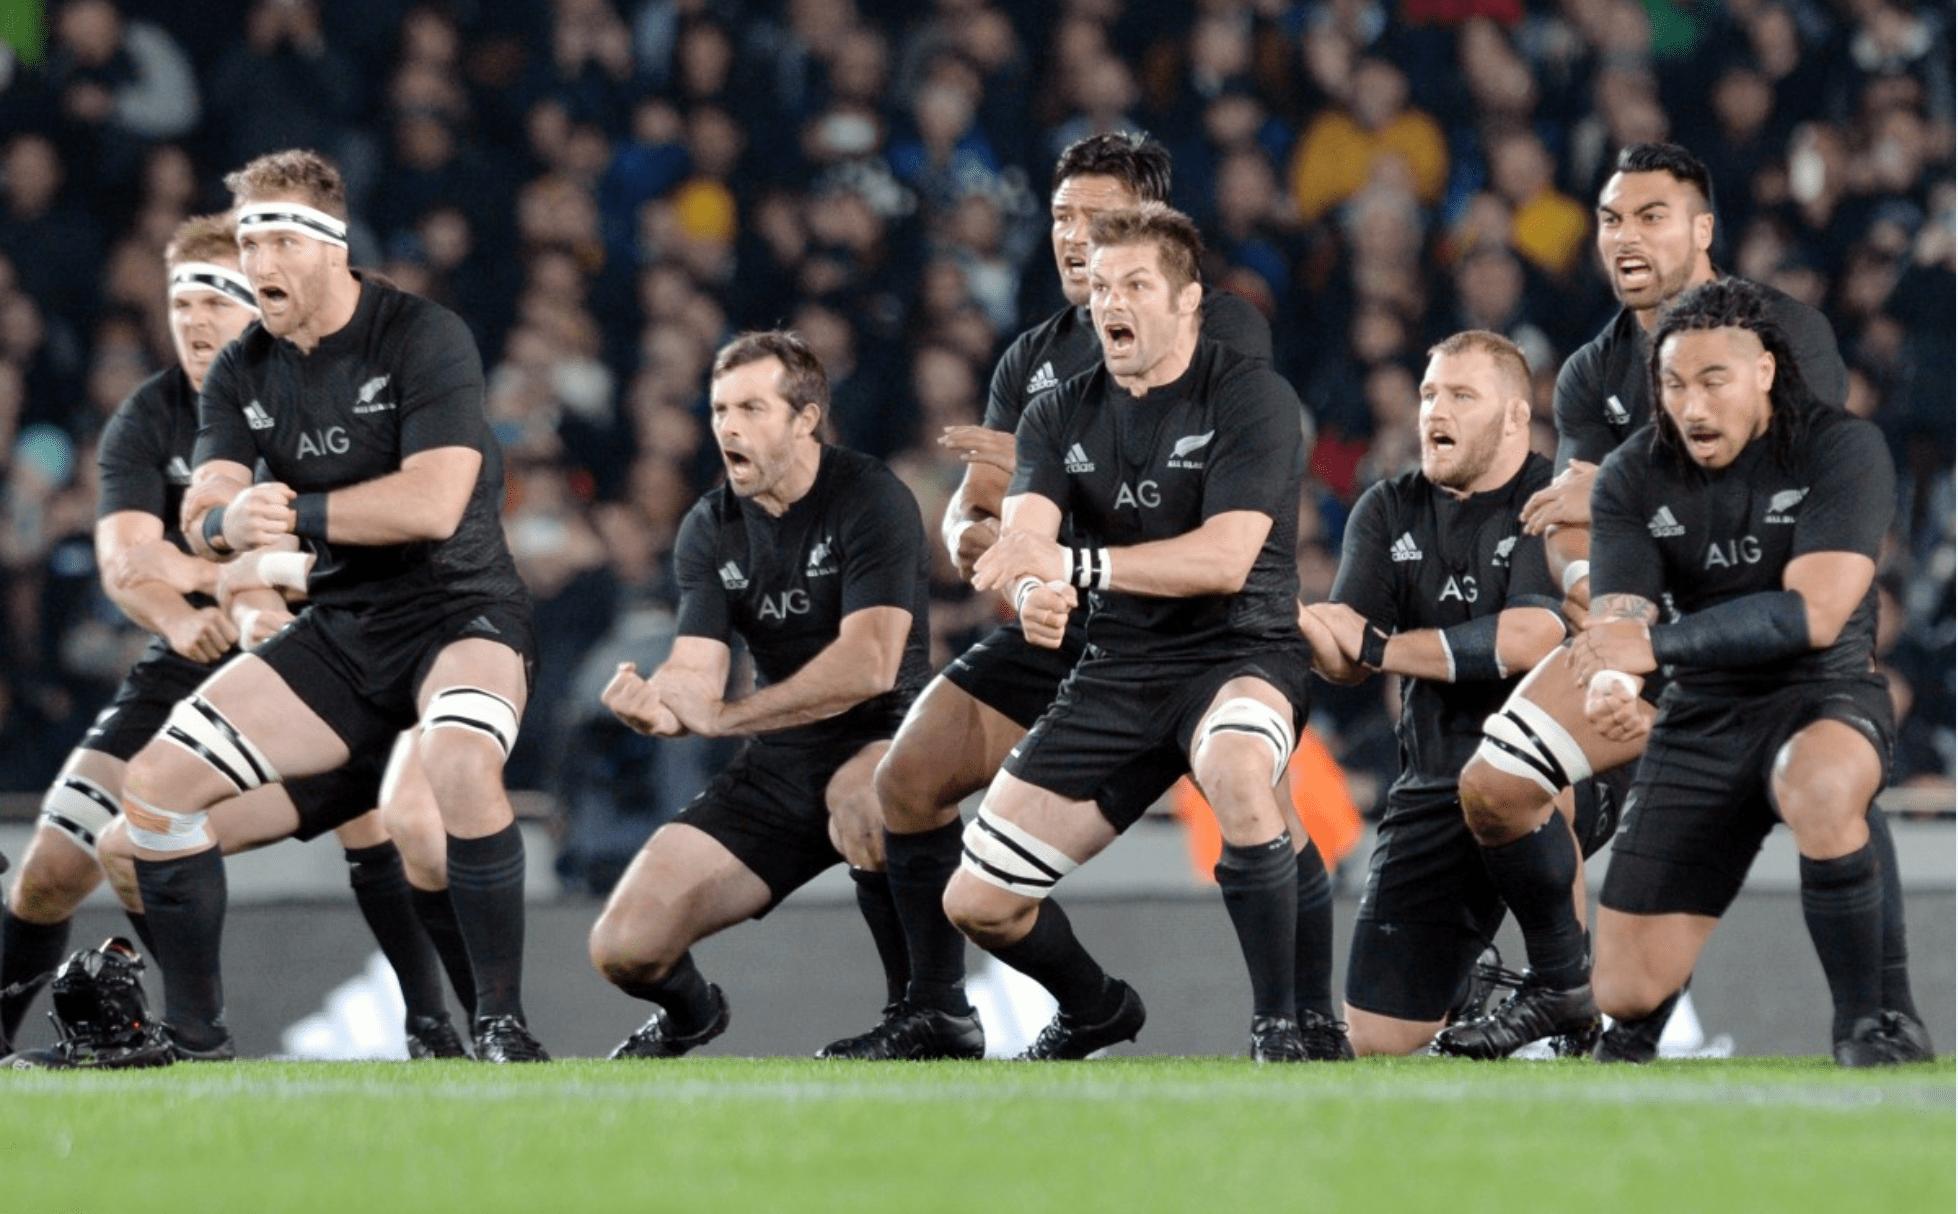 Dan Carter: Record rugby points scorer retires